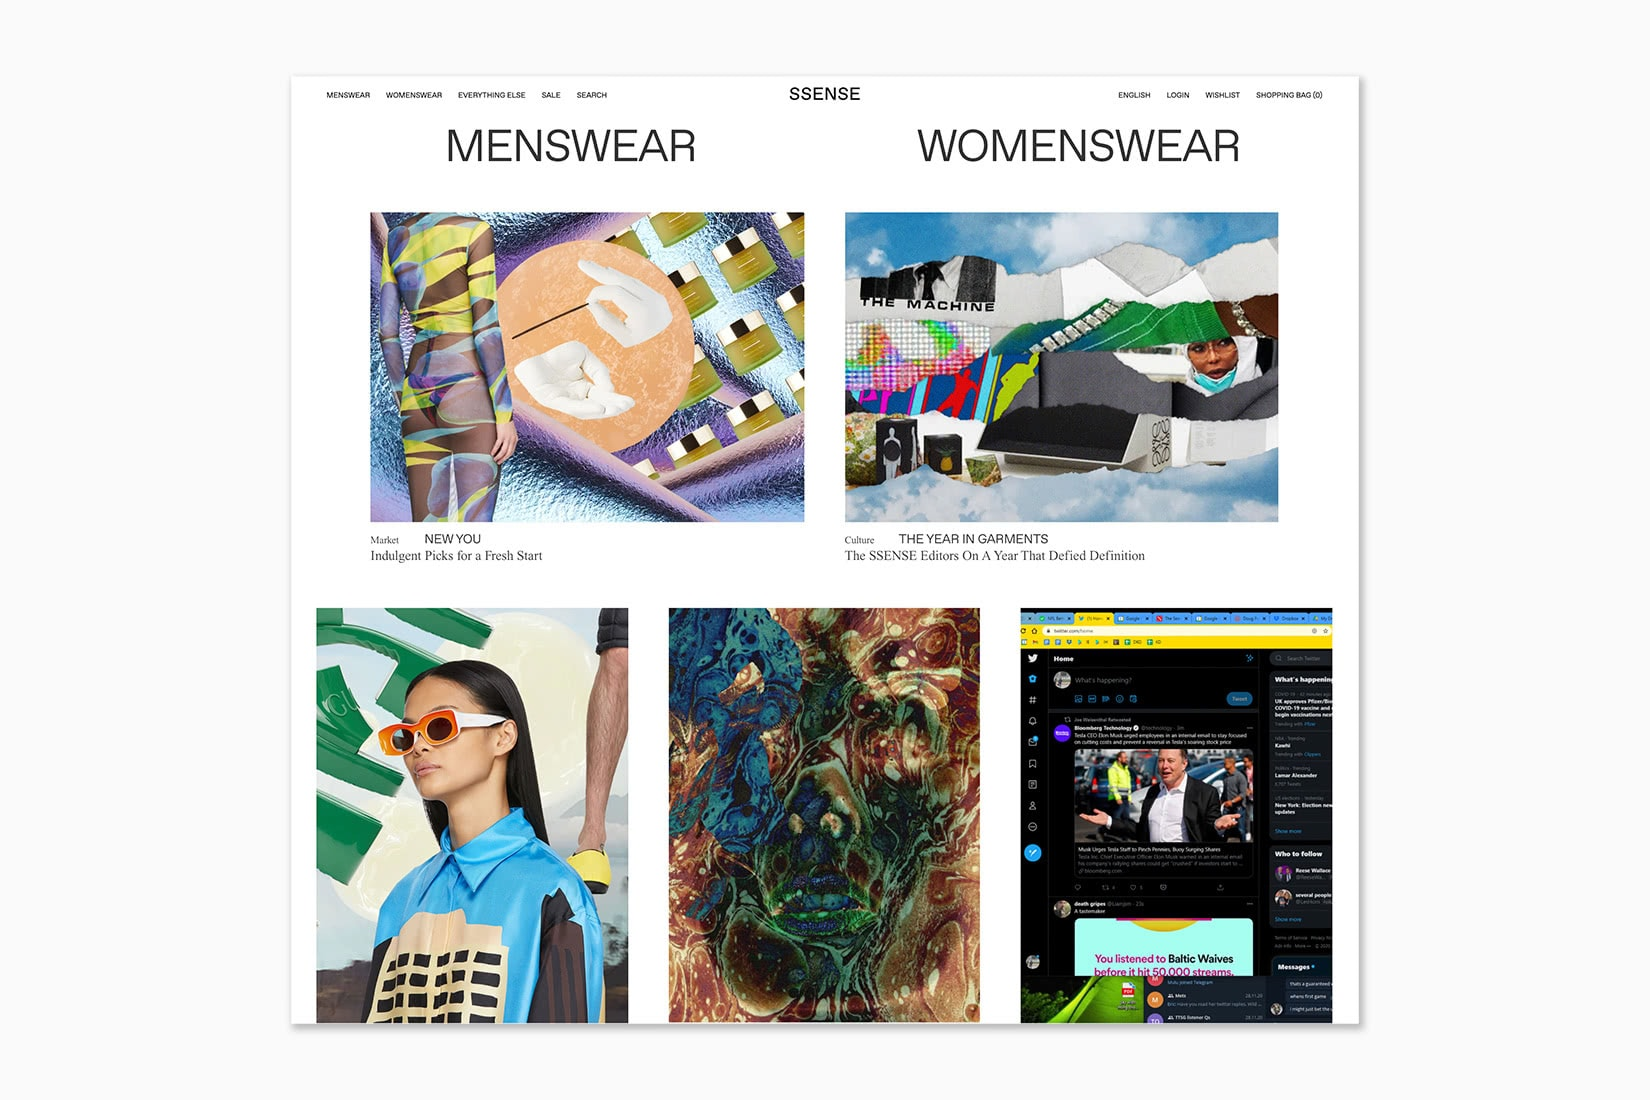 best online shopping sites women SSENSE - Luxe Digital